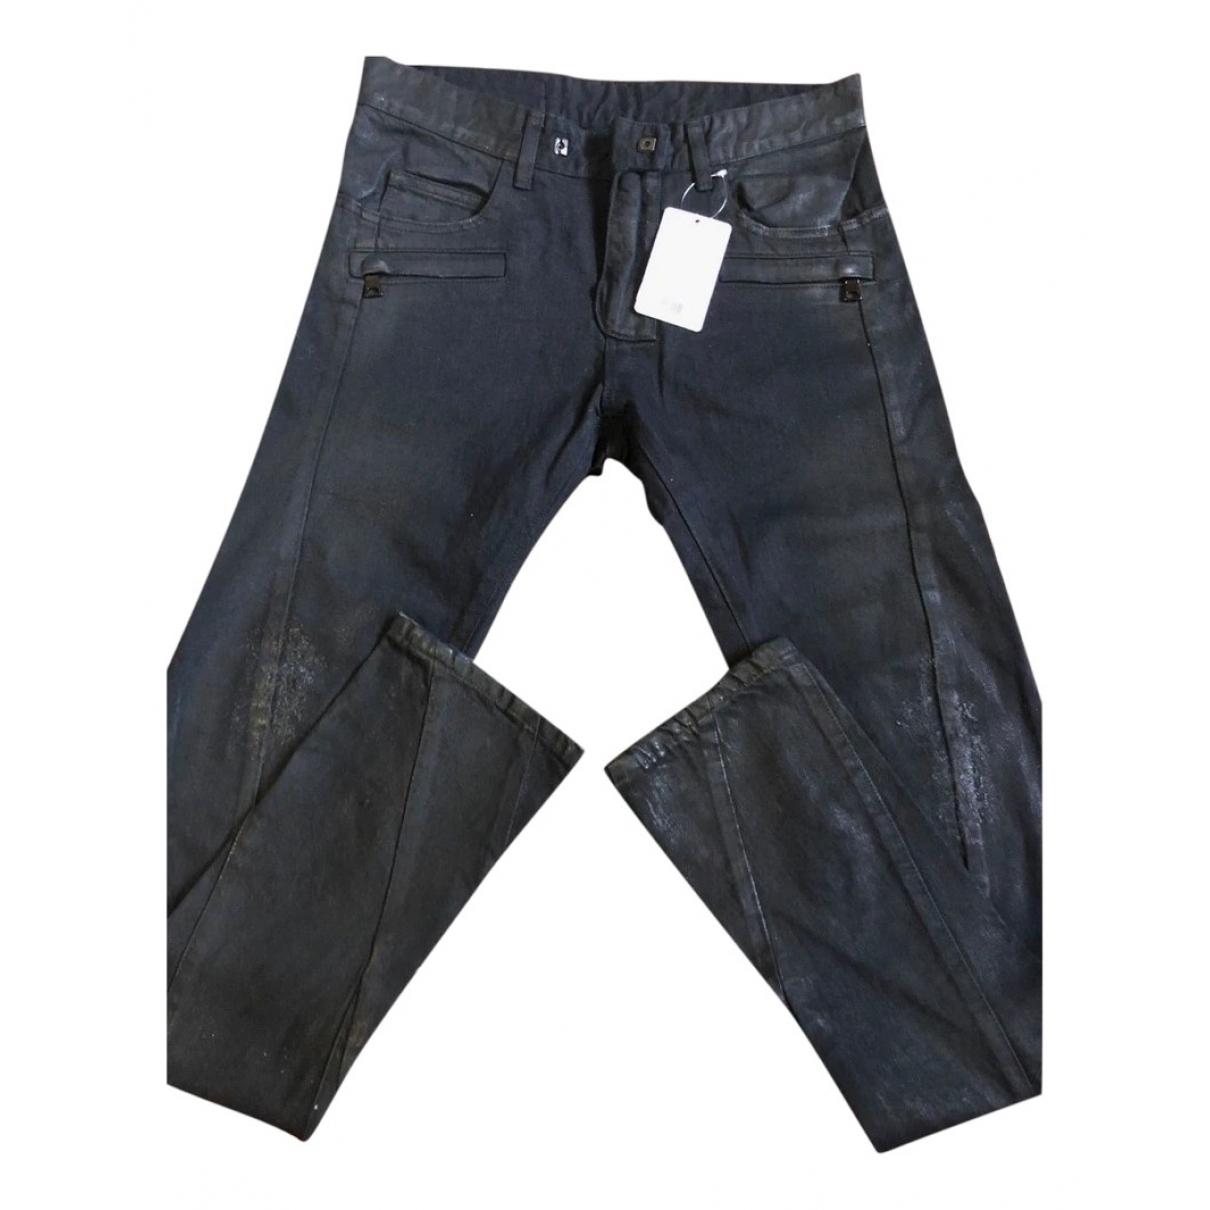 Balmain \N Black Cotton Jeans for Men 28 US